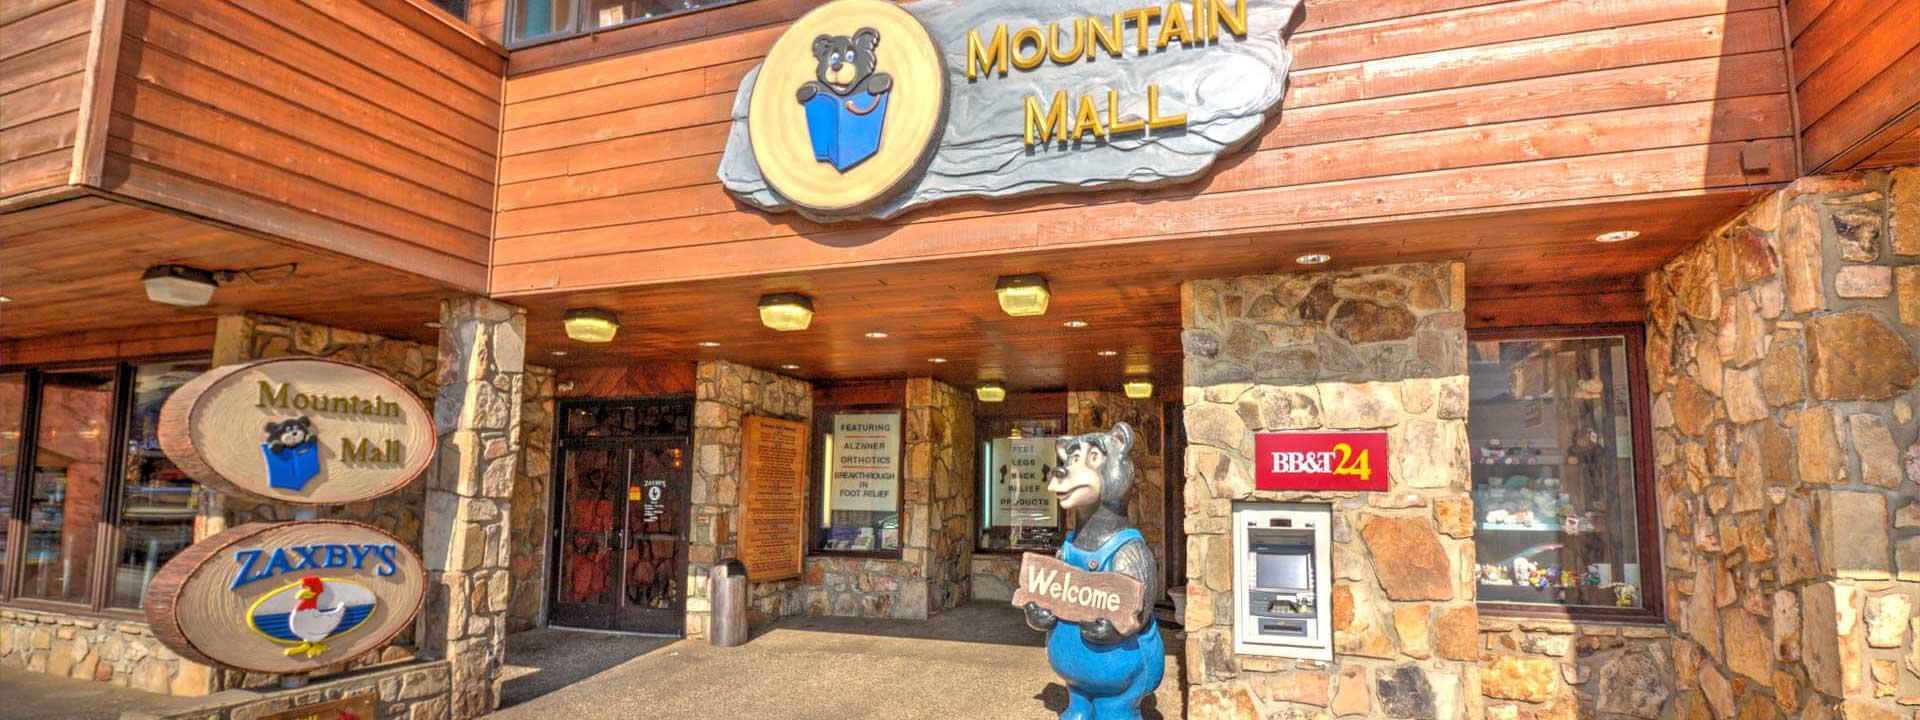 Stores In Gatlinburg Mountain Mall Shopping In Gatlinburg Tn